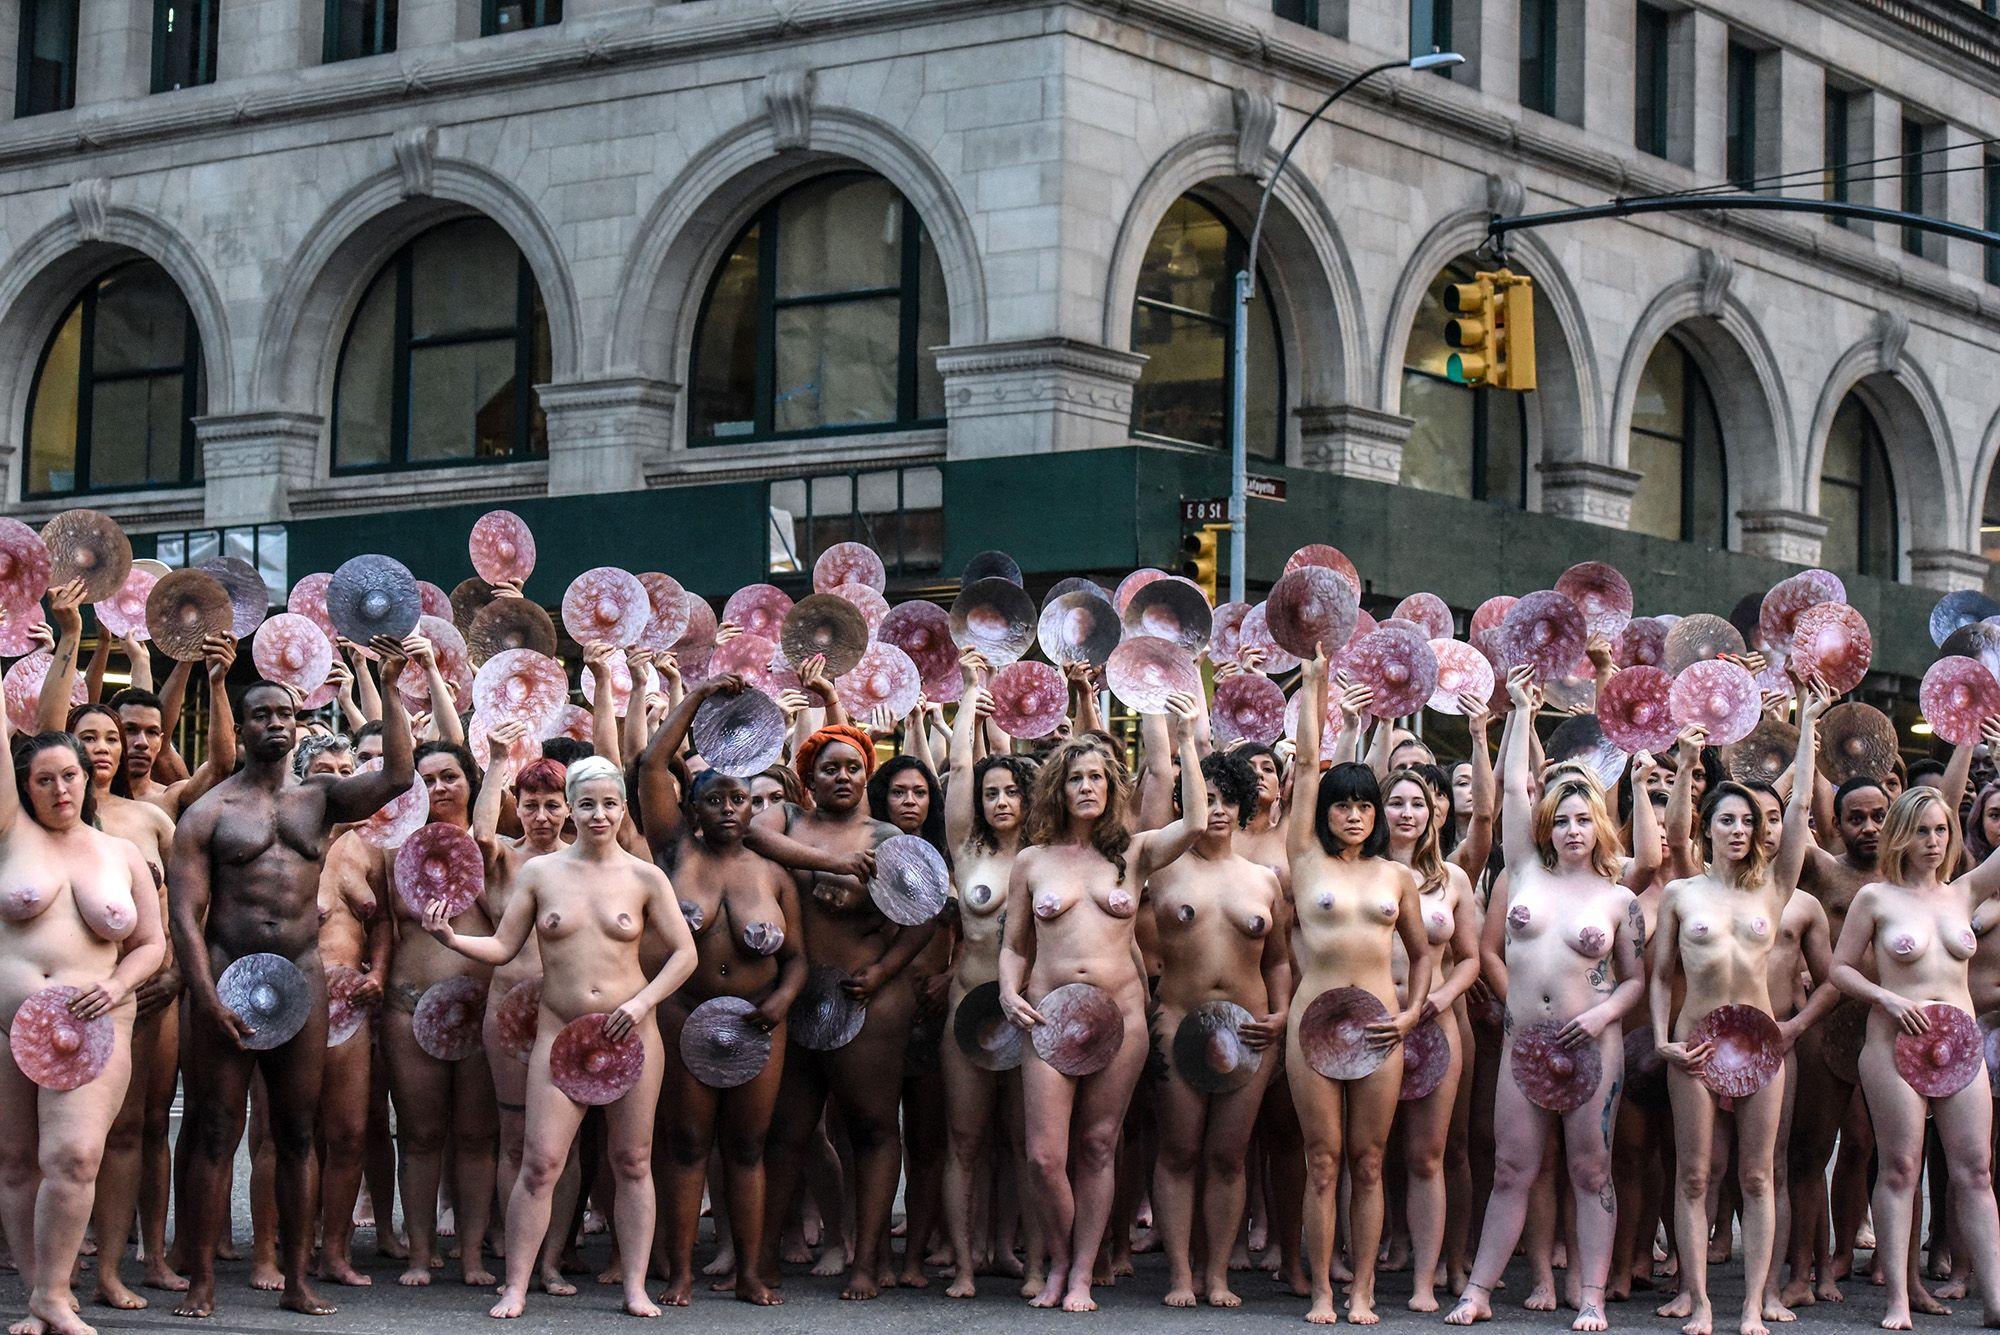 Nude brazilian vagina painting photo